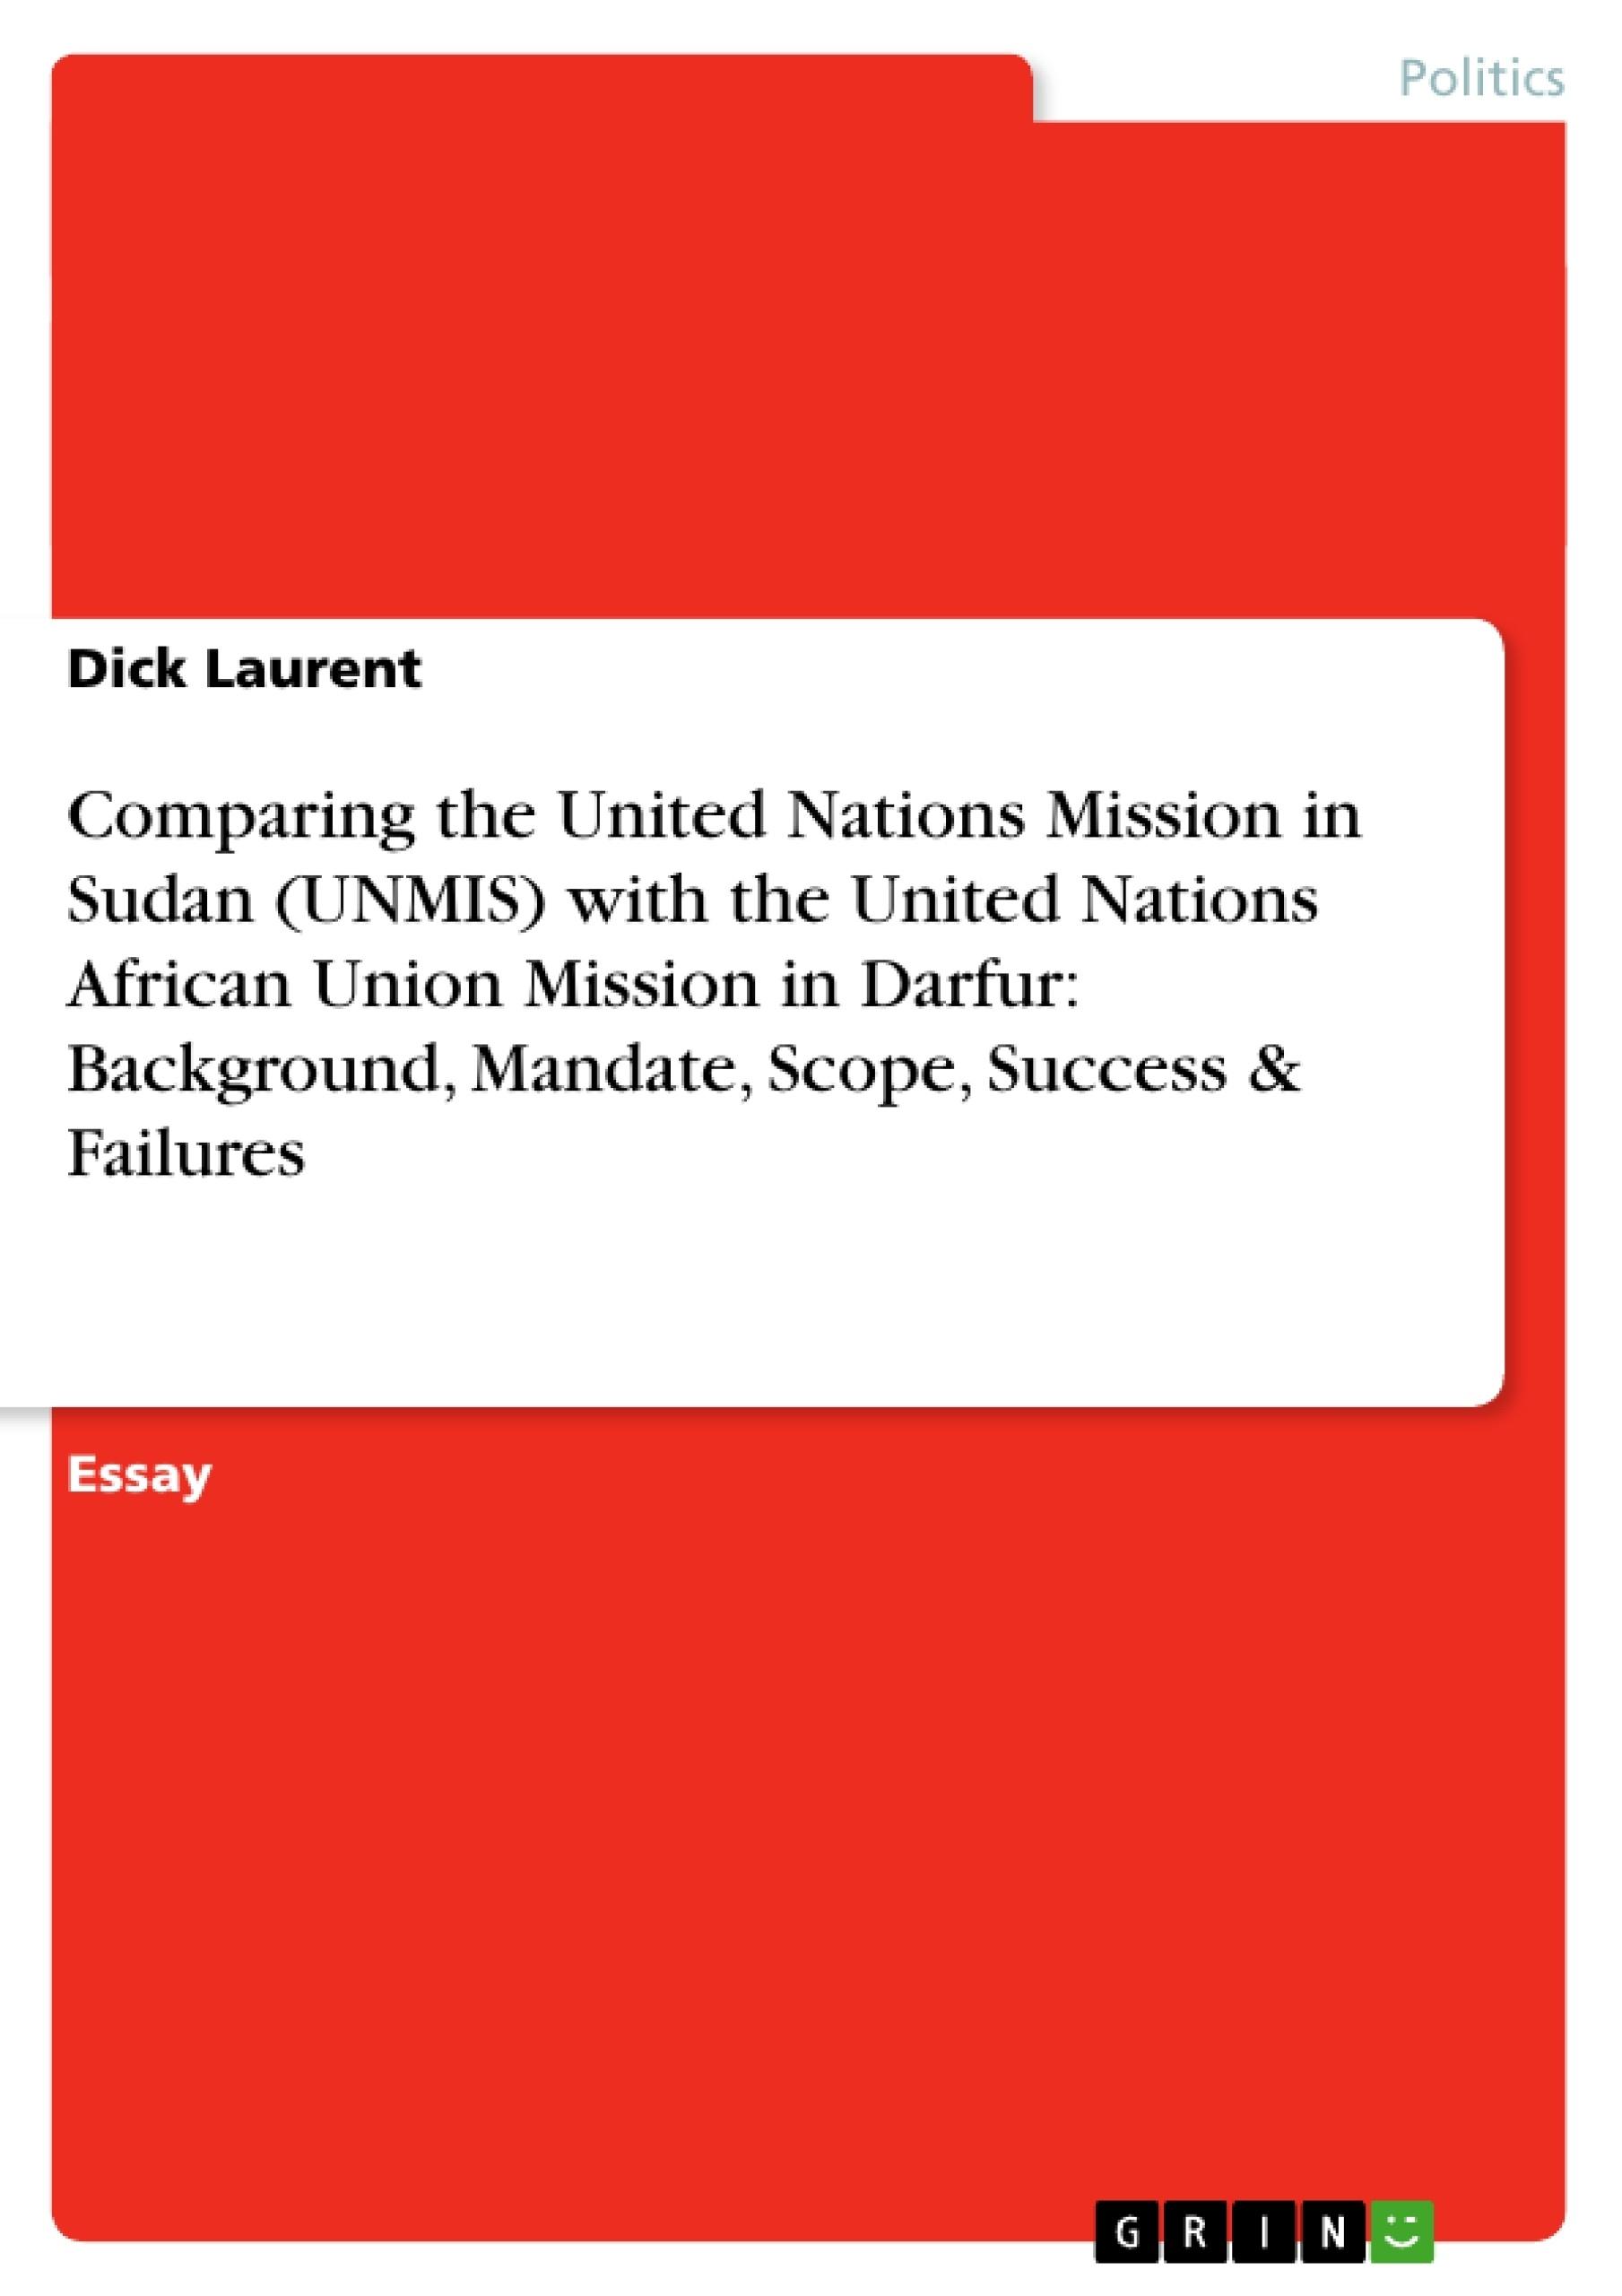 darfur genocide thesis